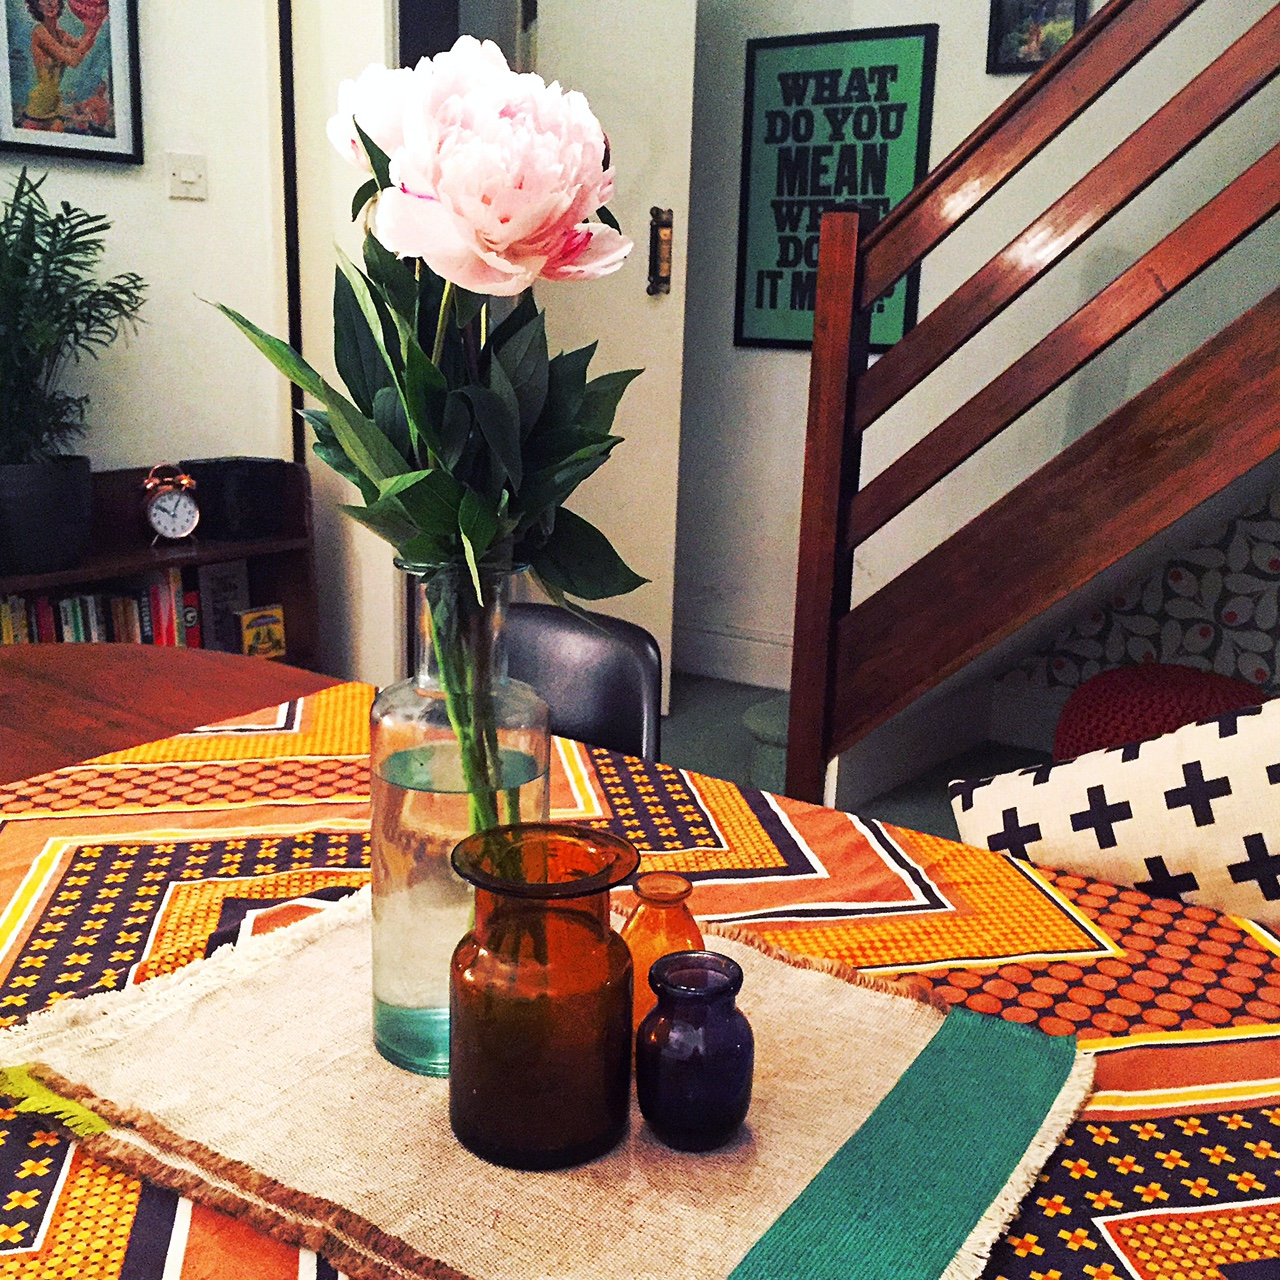 blog-chelt-cheltenham-home-decor-interior-seventies-retro-design-anthony-burrill.jpeg